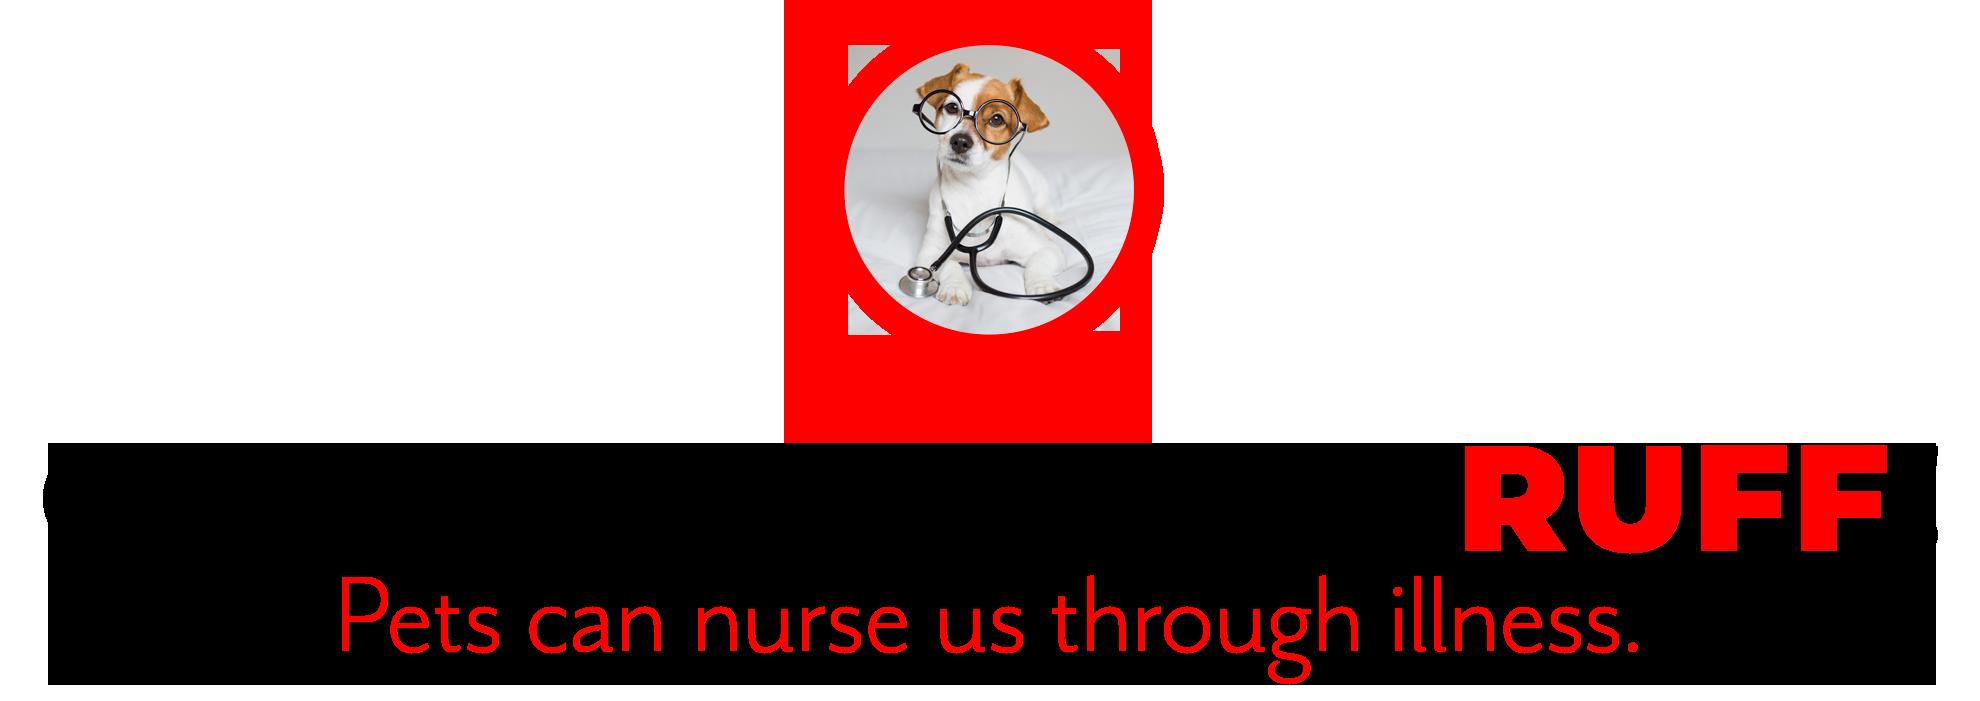 pets-nurse-us-through-illness-hdr-a